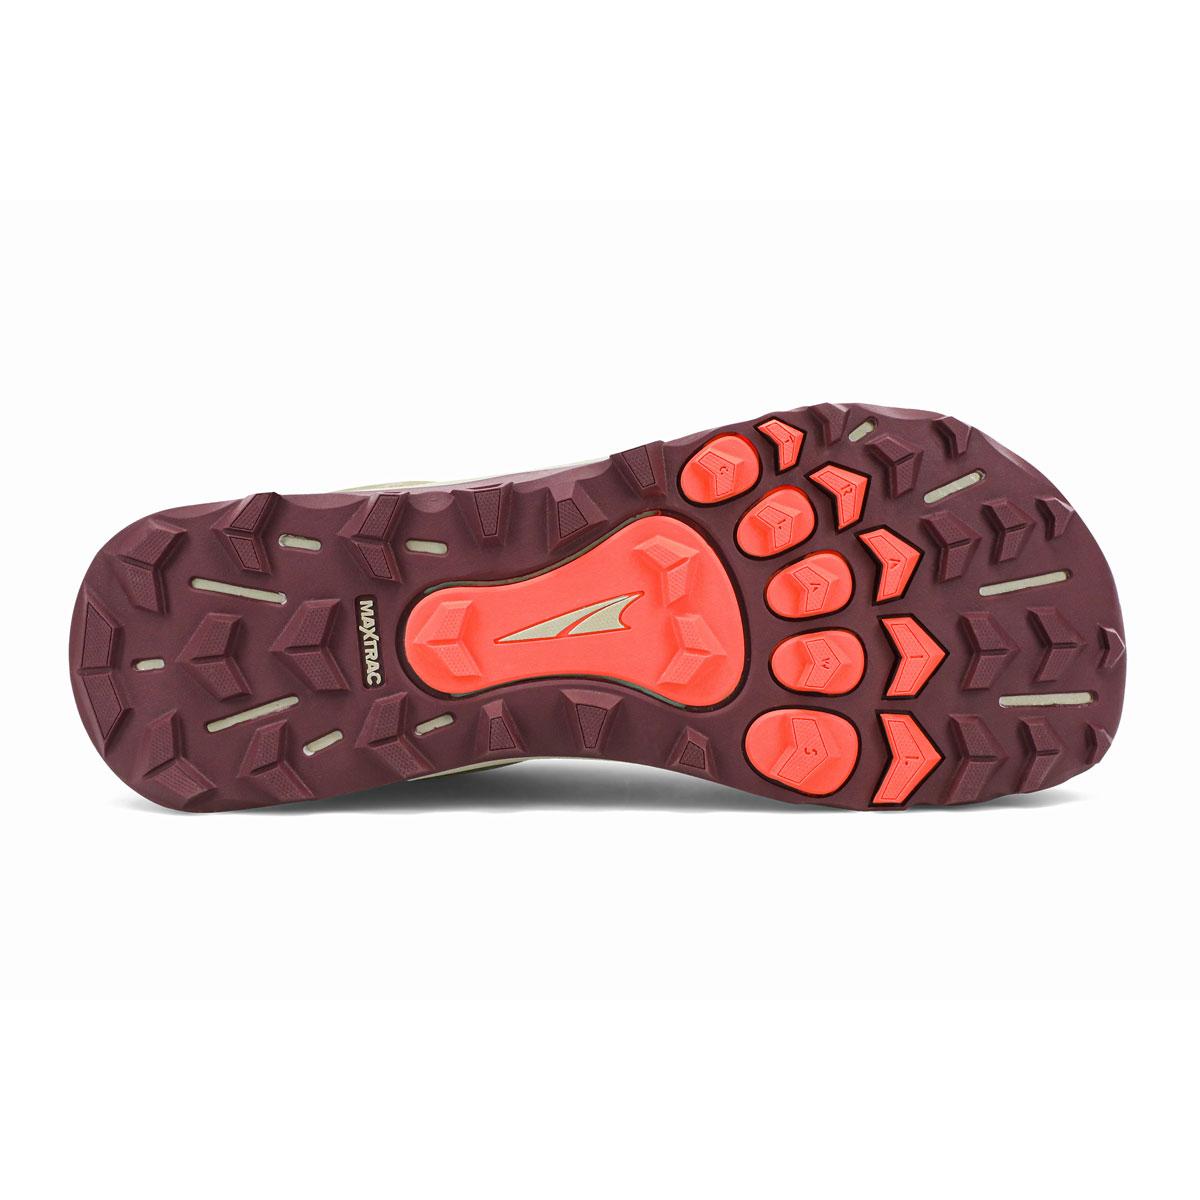 Women's Altra Lone Peak 5 Trail Running Shoe - Color: Khaki - Size: 5.5 - Width: Regular, Khaki, large, image 4